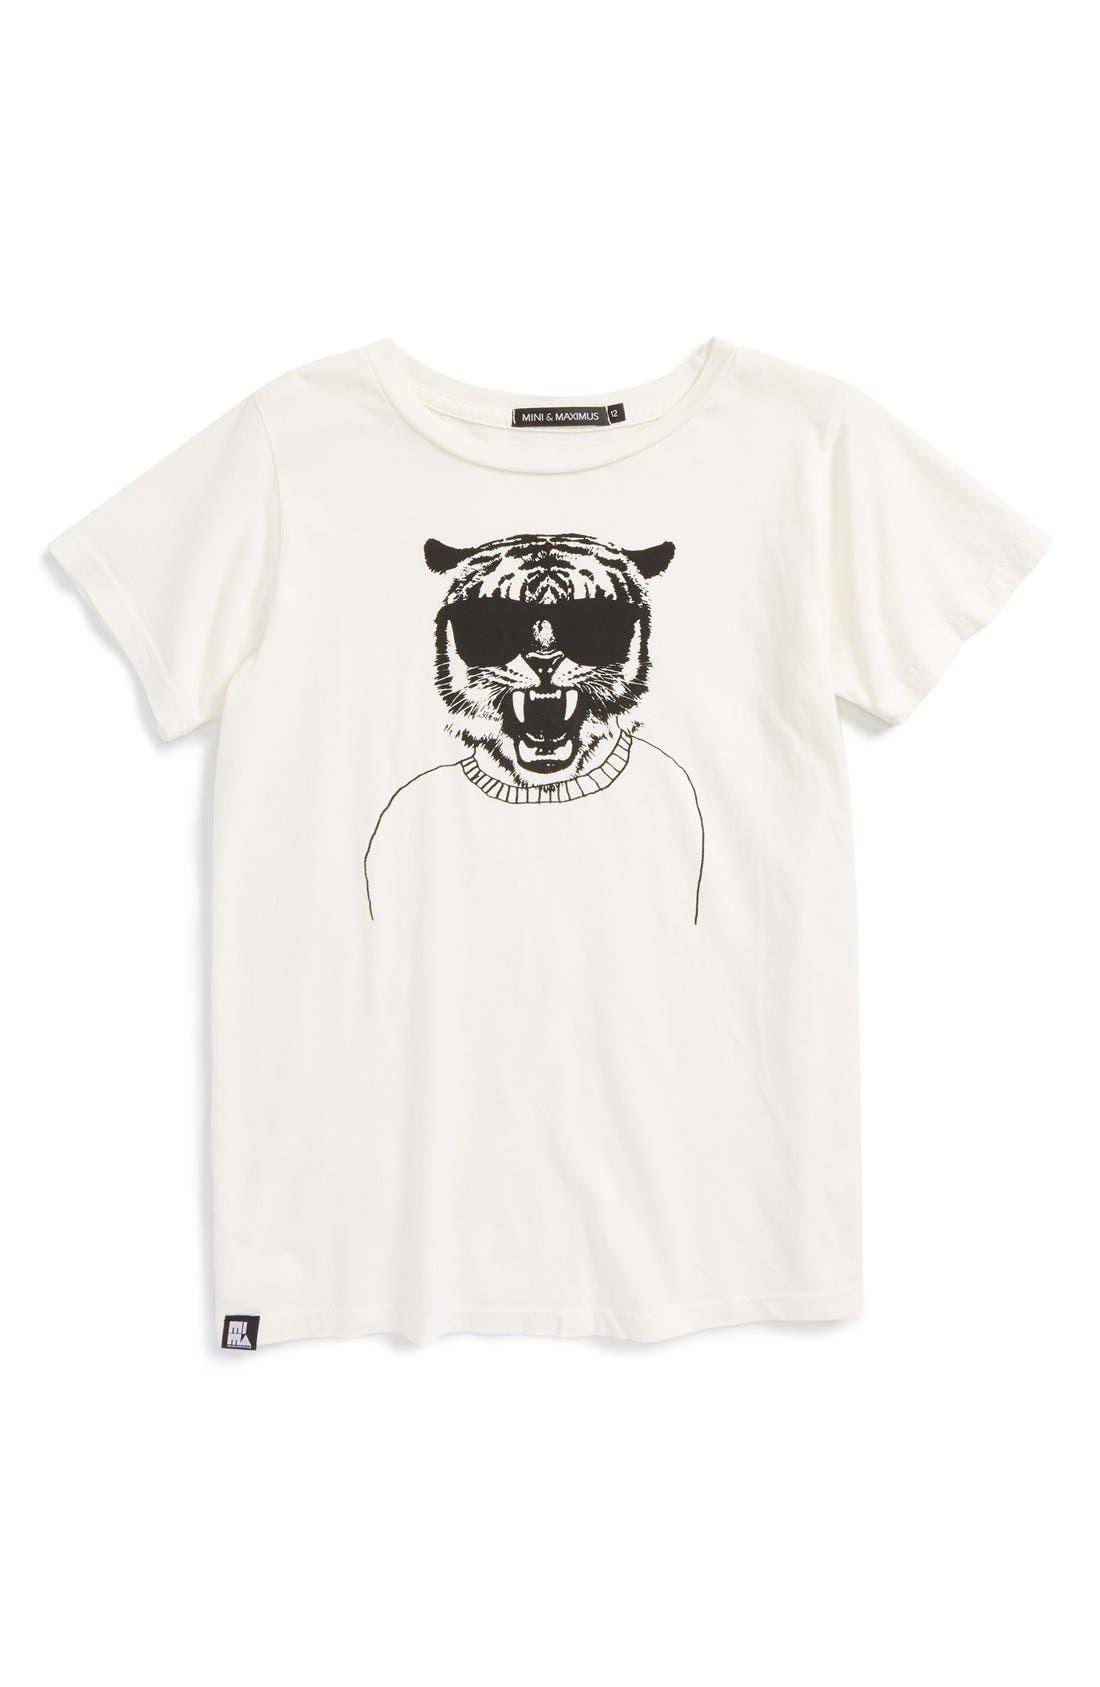 Alternate Image 1 Selected - Mini &Maximus'I Bite' Graphic T-Shirt(Toddler Boys, Little Boys & Big Boys)